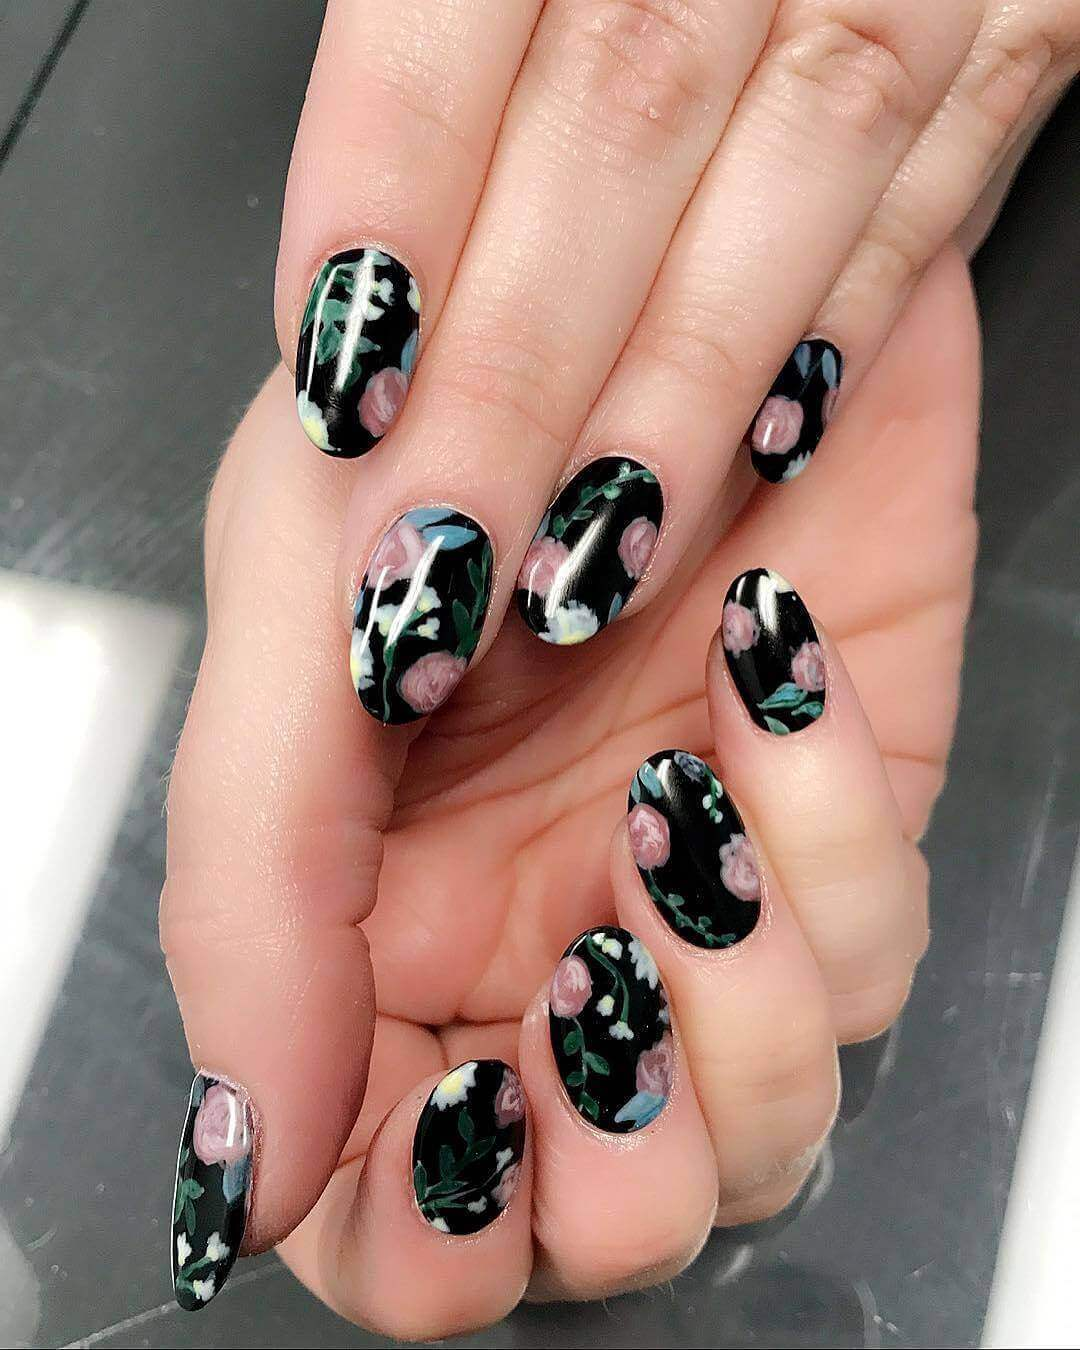 gel-nail-designs-vvpretty